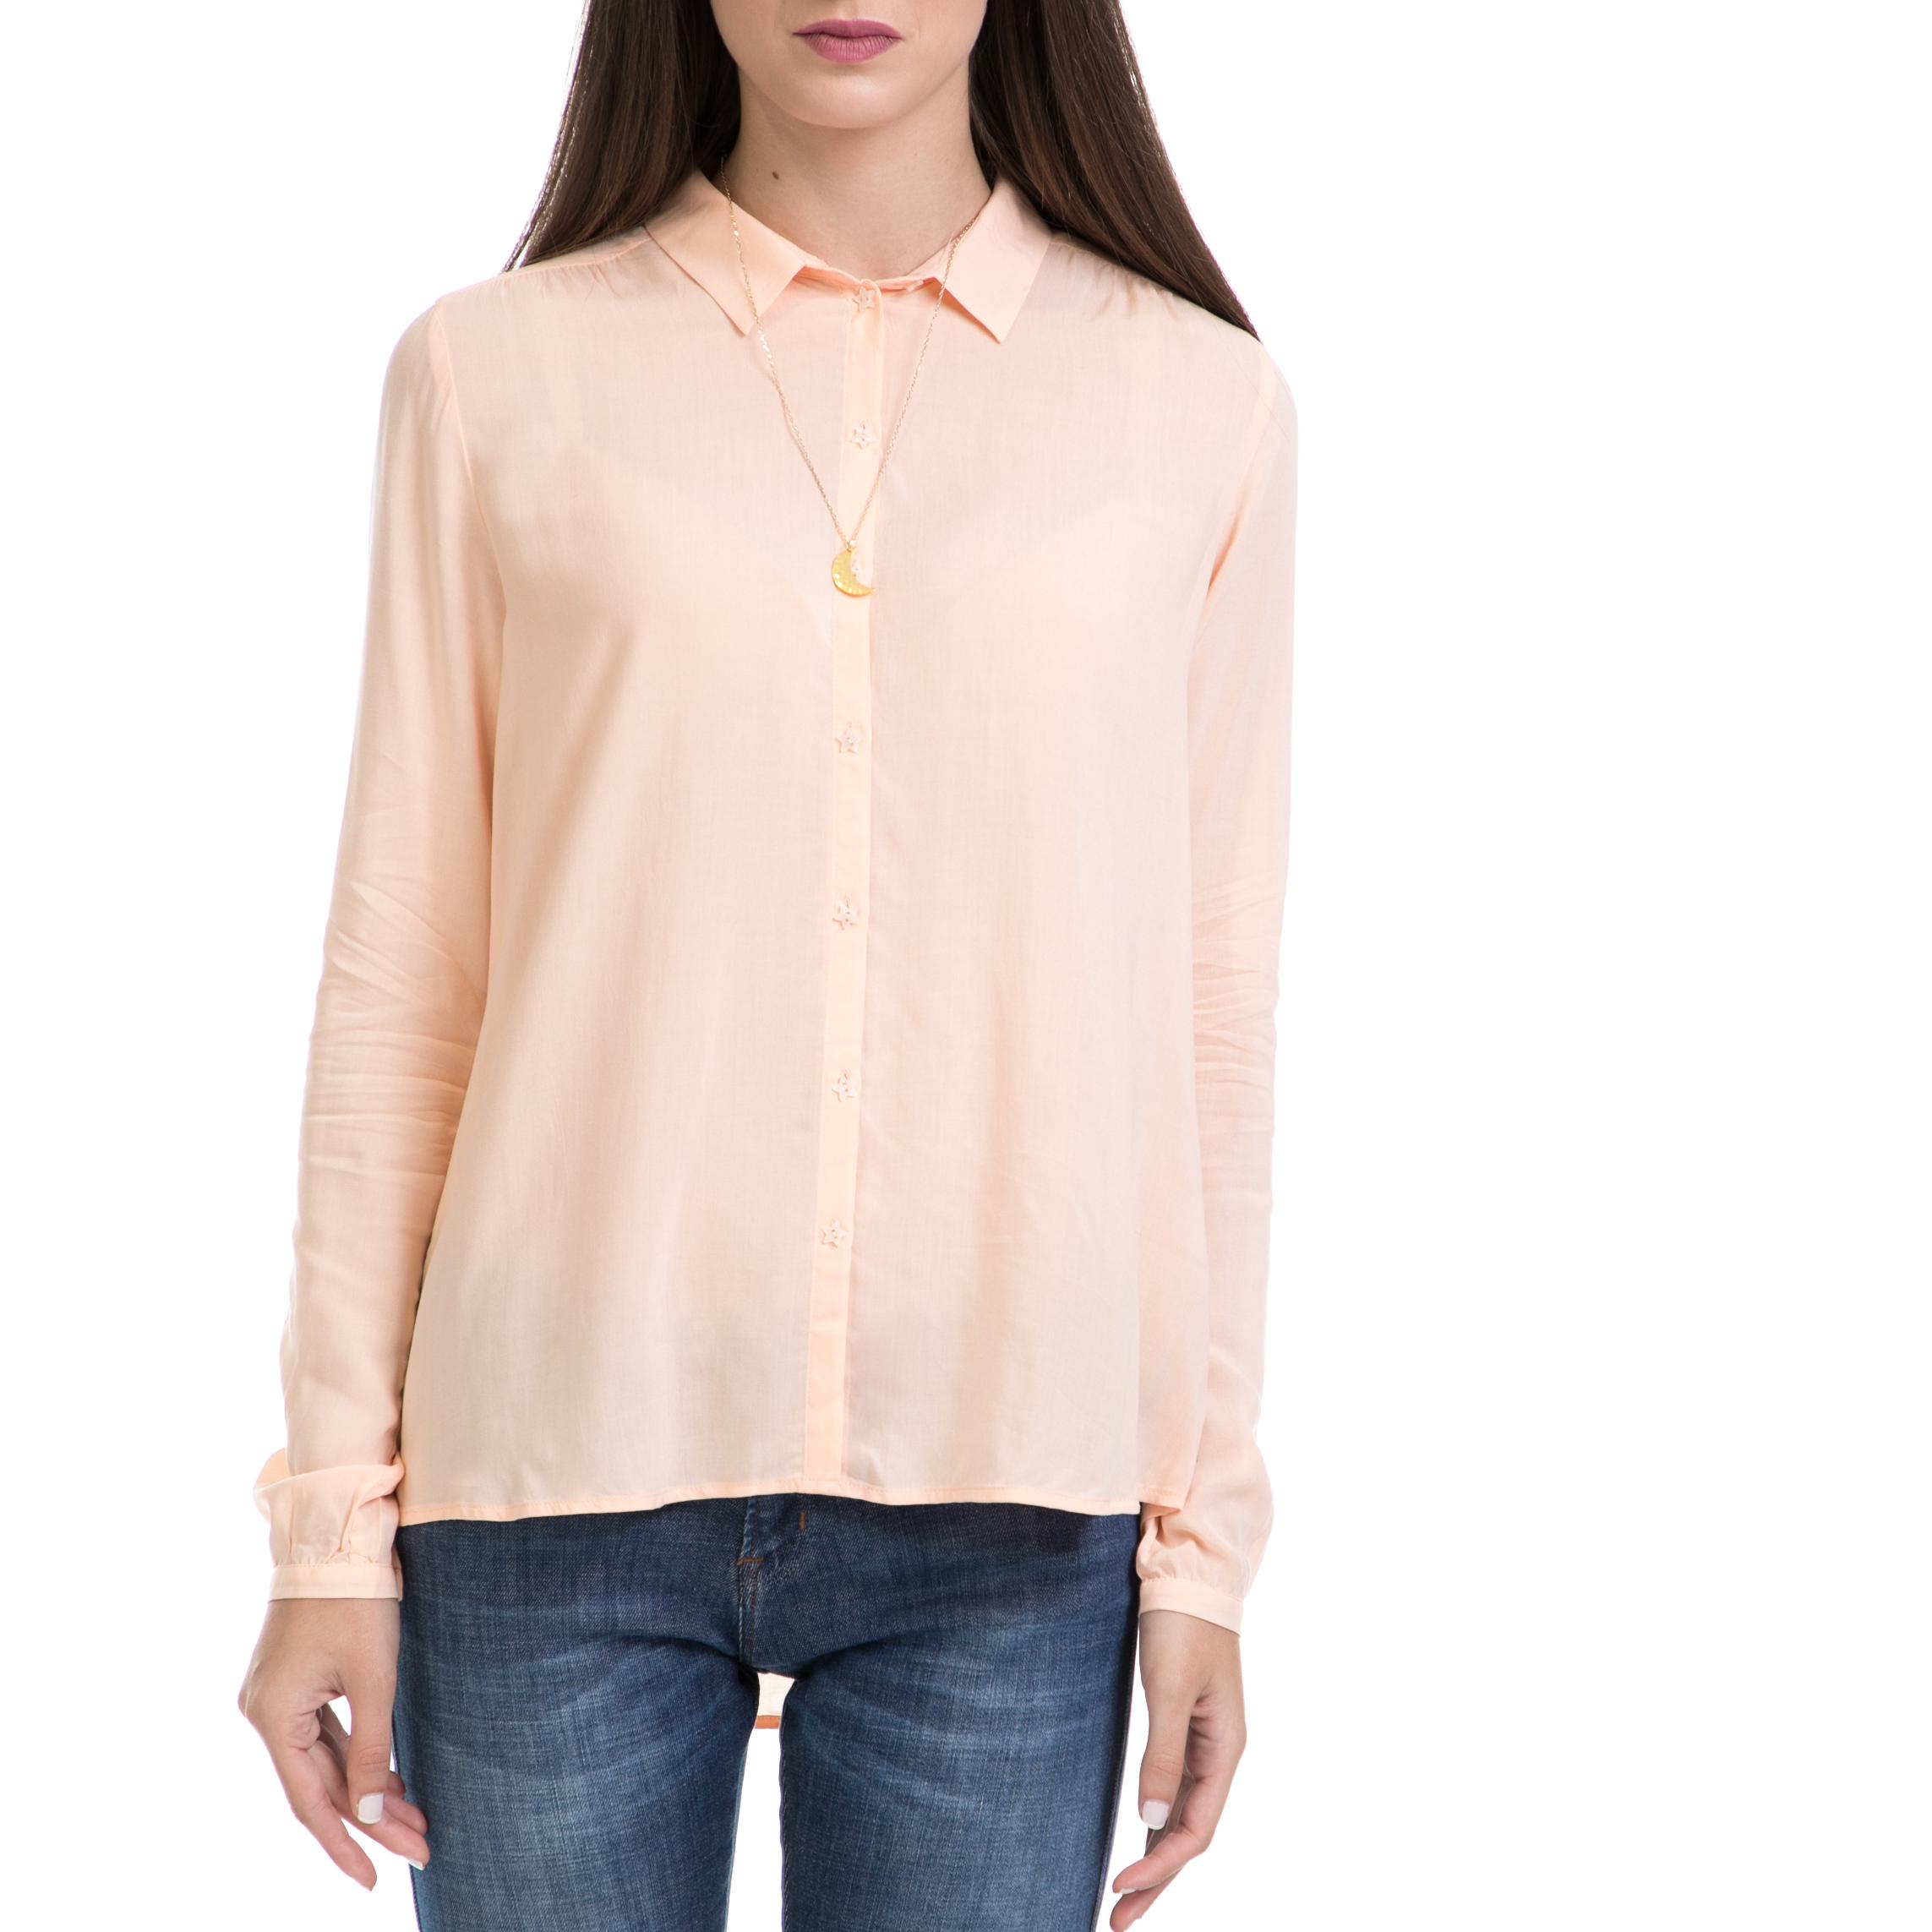 SCOTCH   SODA – Γυναικείο πουκάμισο MAISON SCOTCH πορτοκαλί 3ebb90fadb2